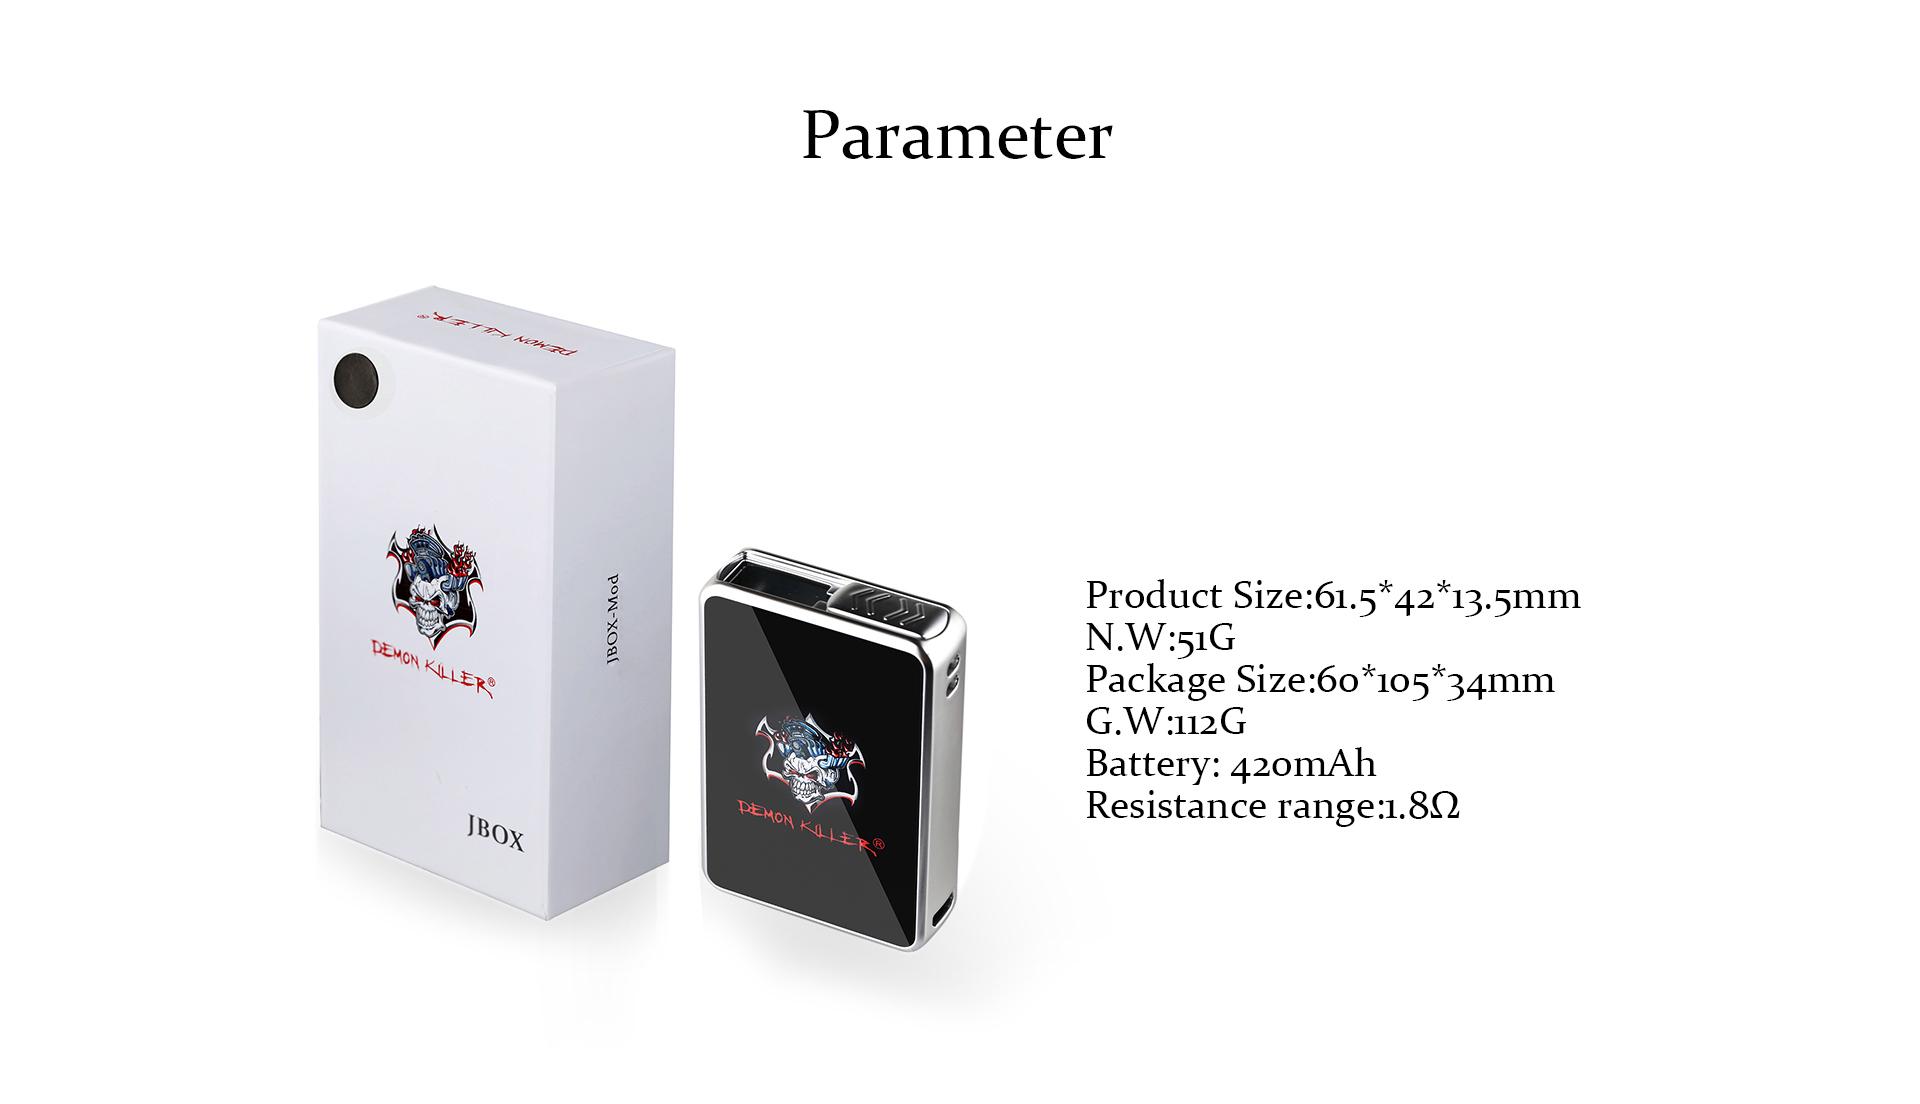 Demon Killer JBOX Mod pod system vape 420mAh battery Compatible with Juul Pod